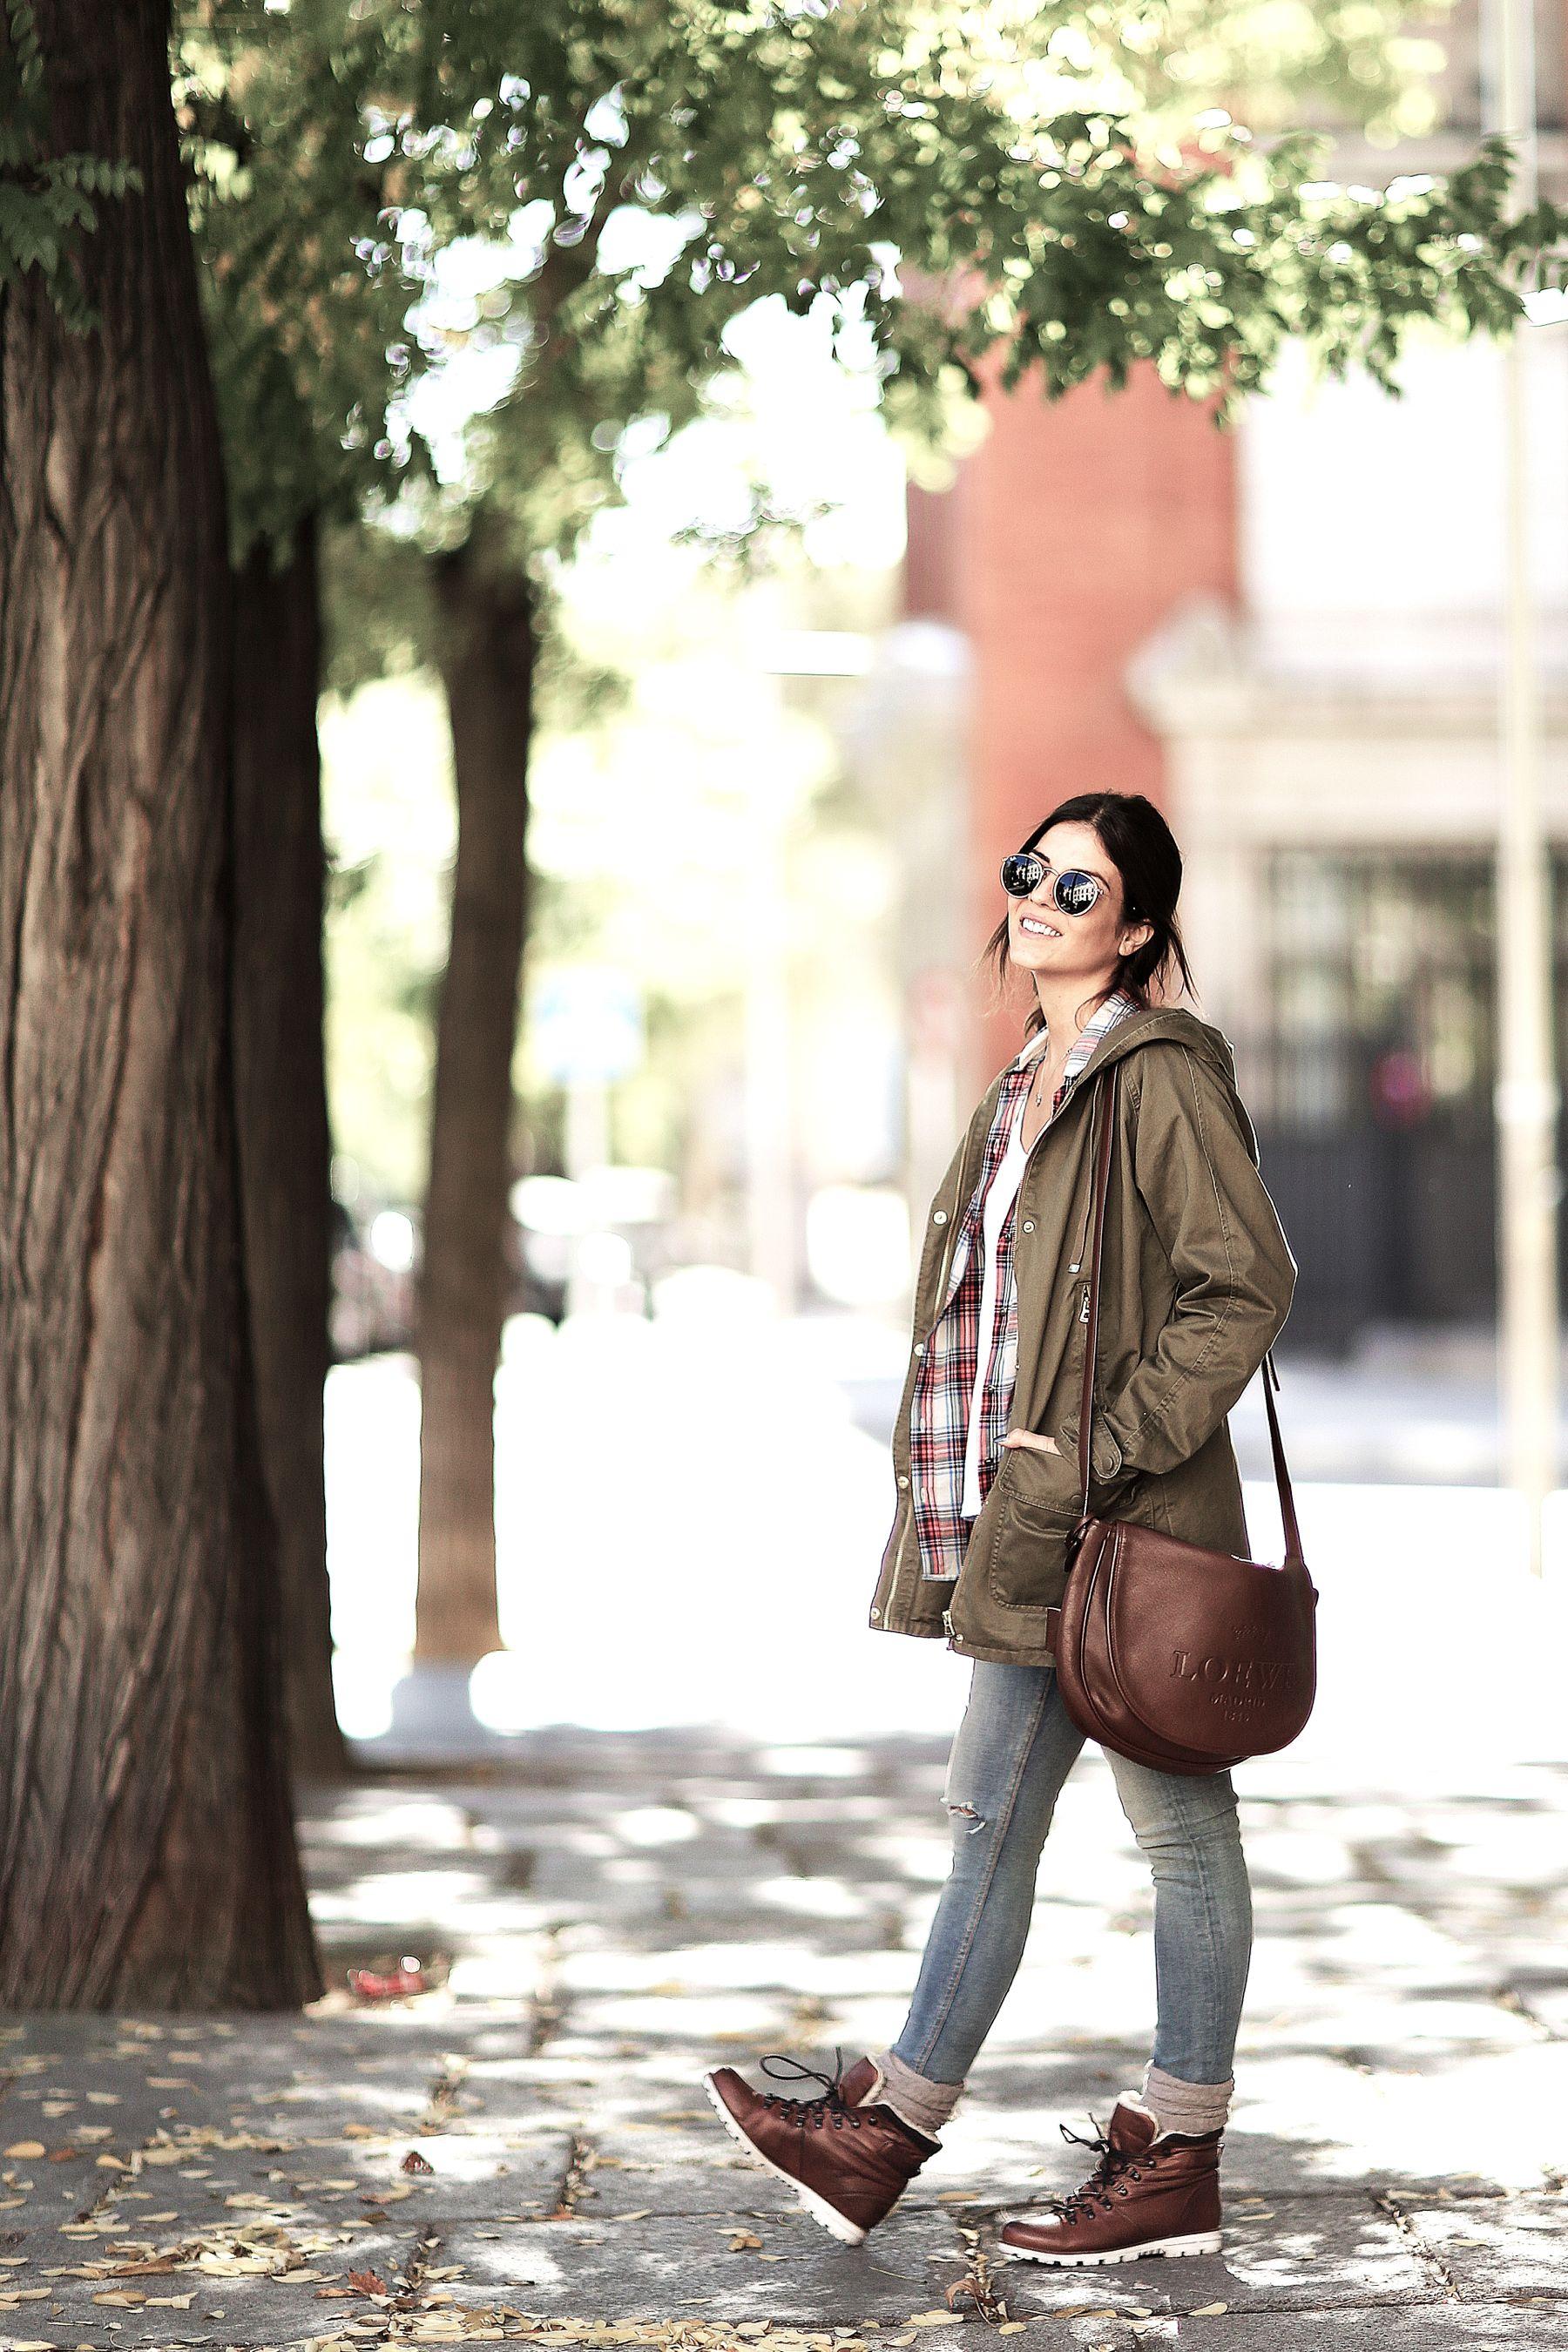 trendy-taste-look-outfit-street-style-trekking-tendencia-botas-parka-camisa-cuadros-plaid-shirt-fall-otoño-2